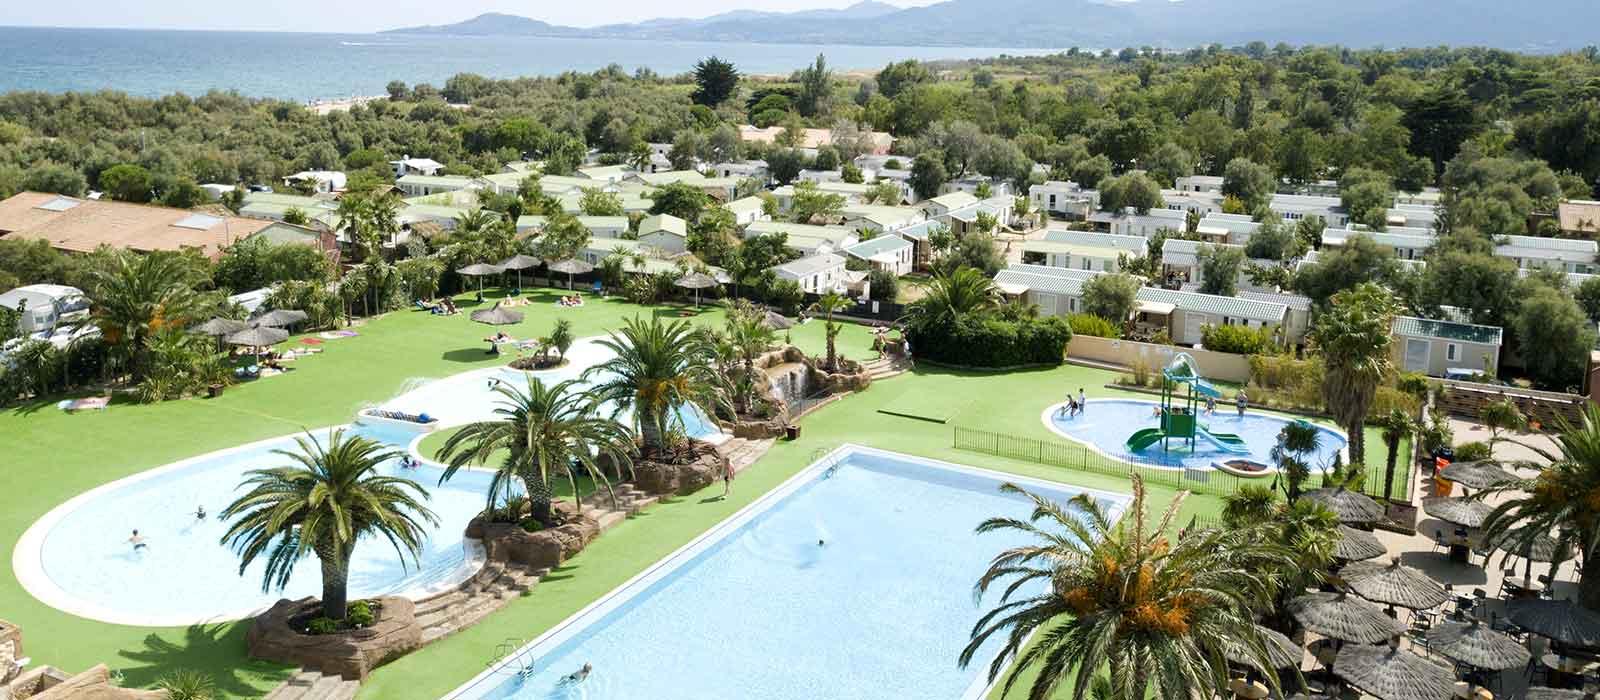 camping en méditerranée